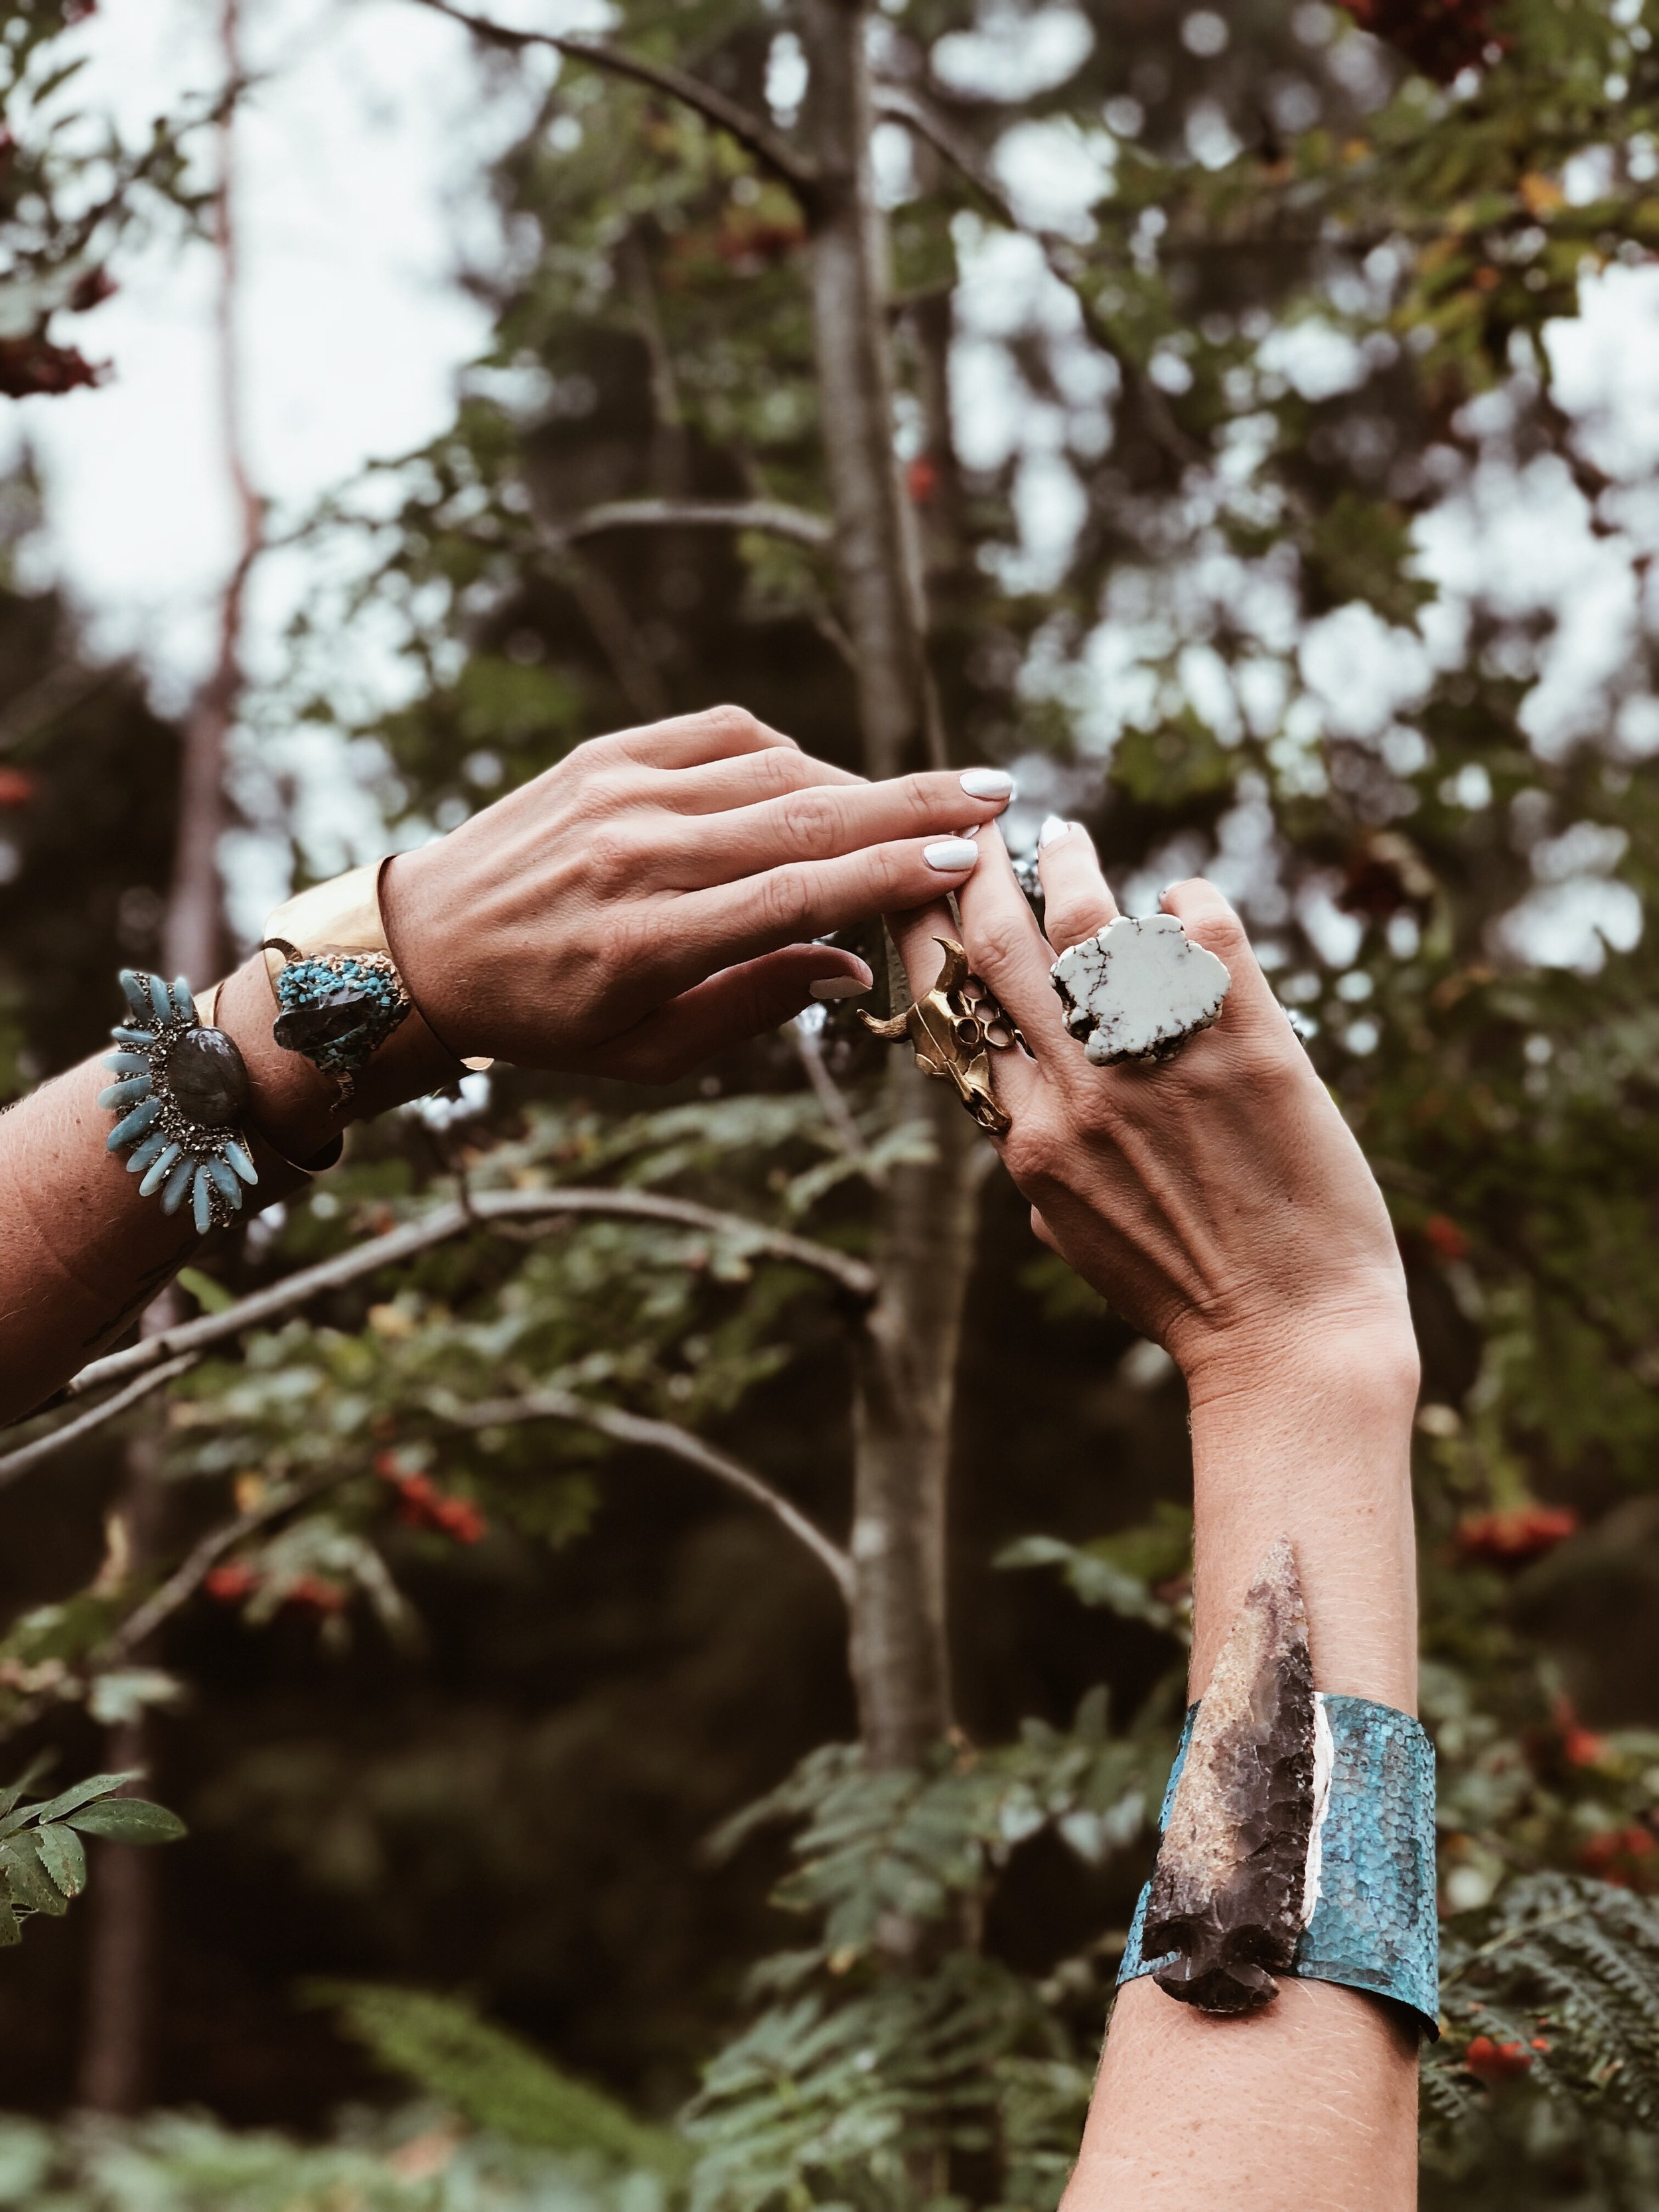 Carnet Sauvage - blog mode femme lille -visual story teller - wild christina rose3.jpg